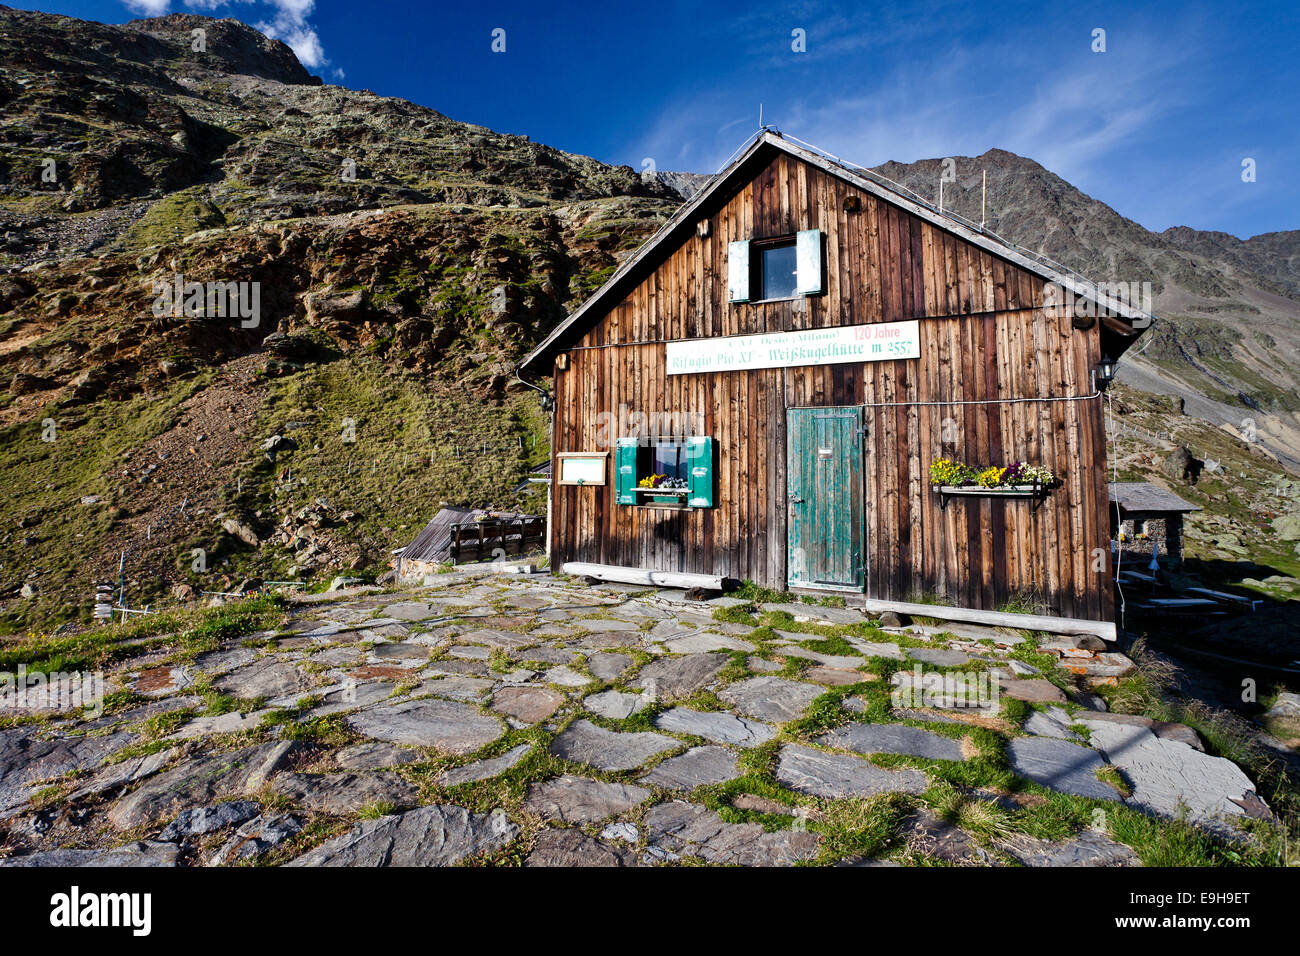 Alte Weisskugelhütte or Rifugio Pio XI, refuge, Langtauferer Tal valley, South Tyrol, Trentino-Alto Adige, - Stock Image